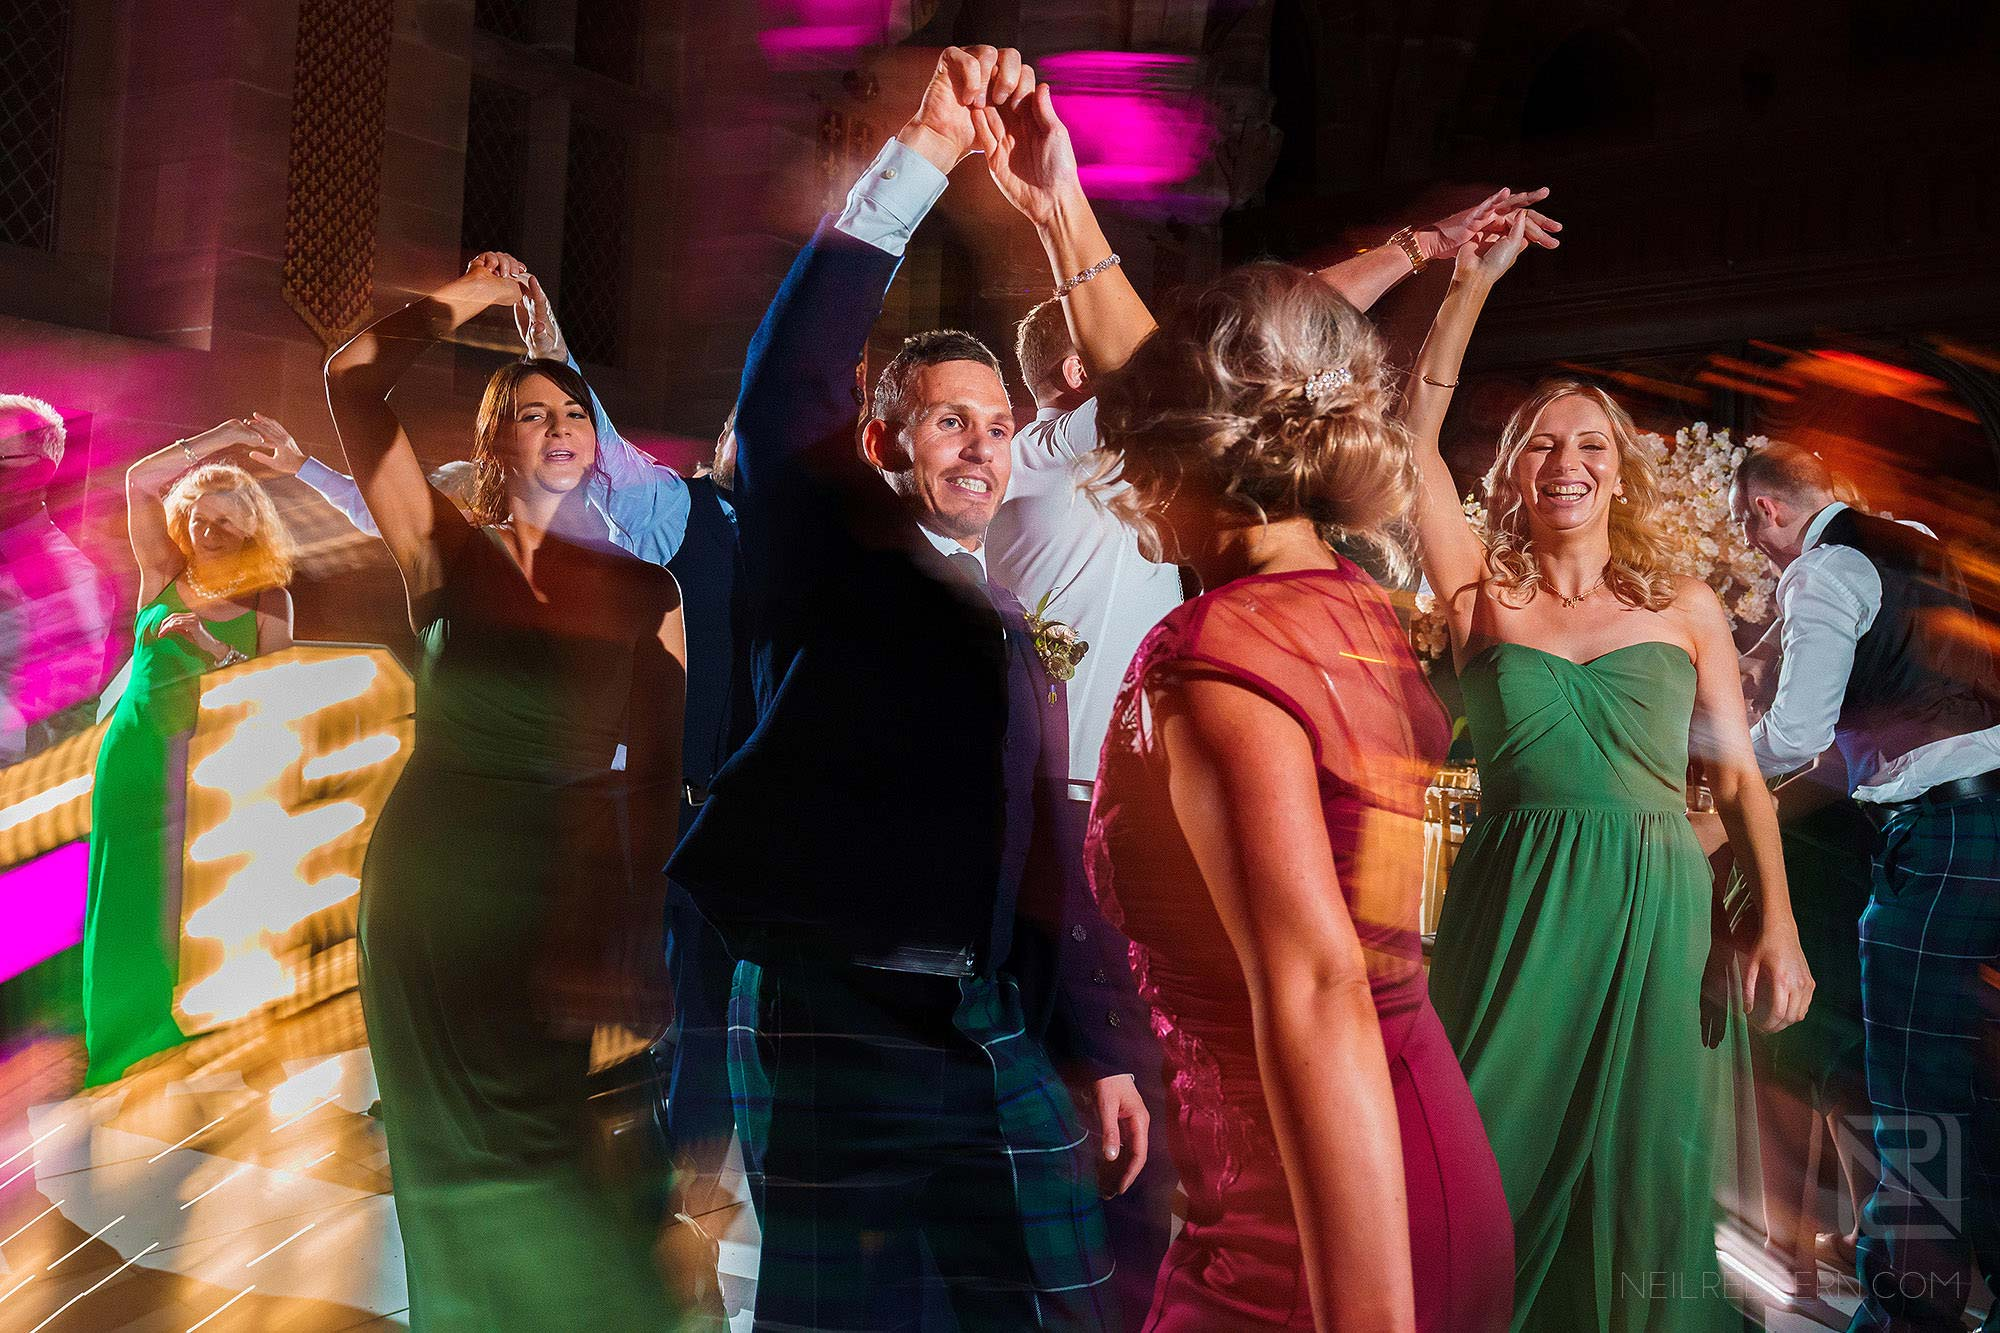 scottish dancing at Peckforton Castle